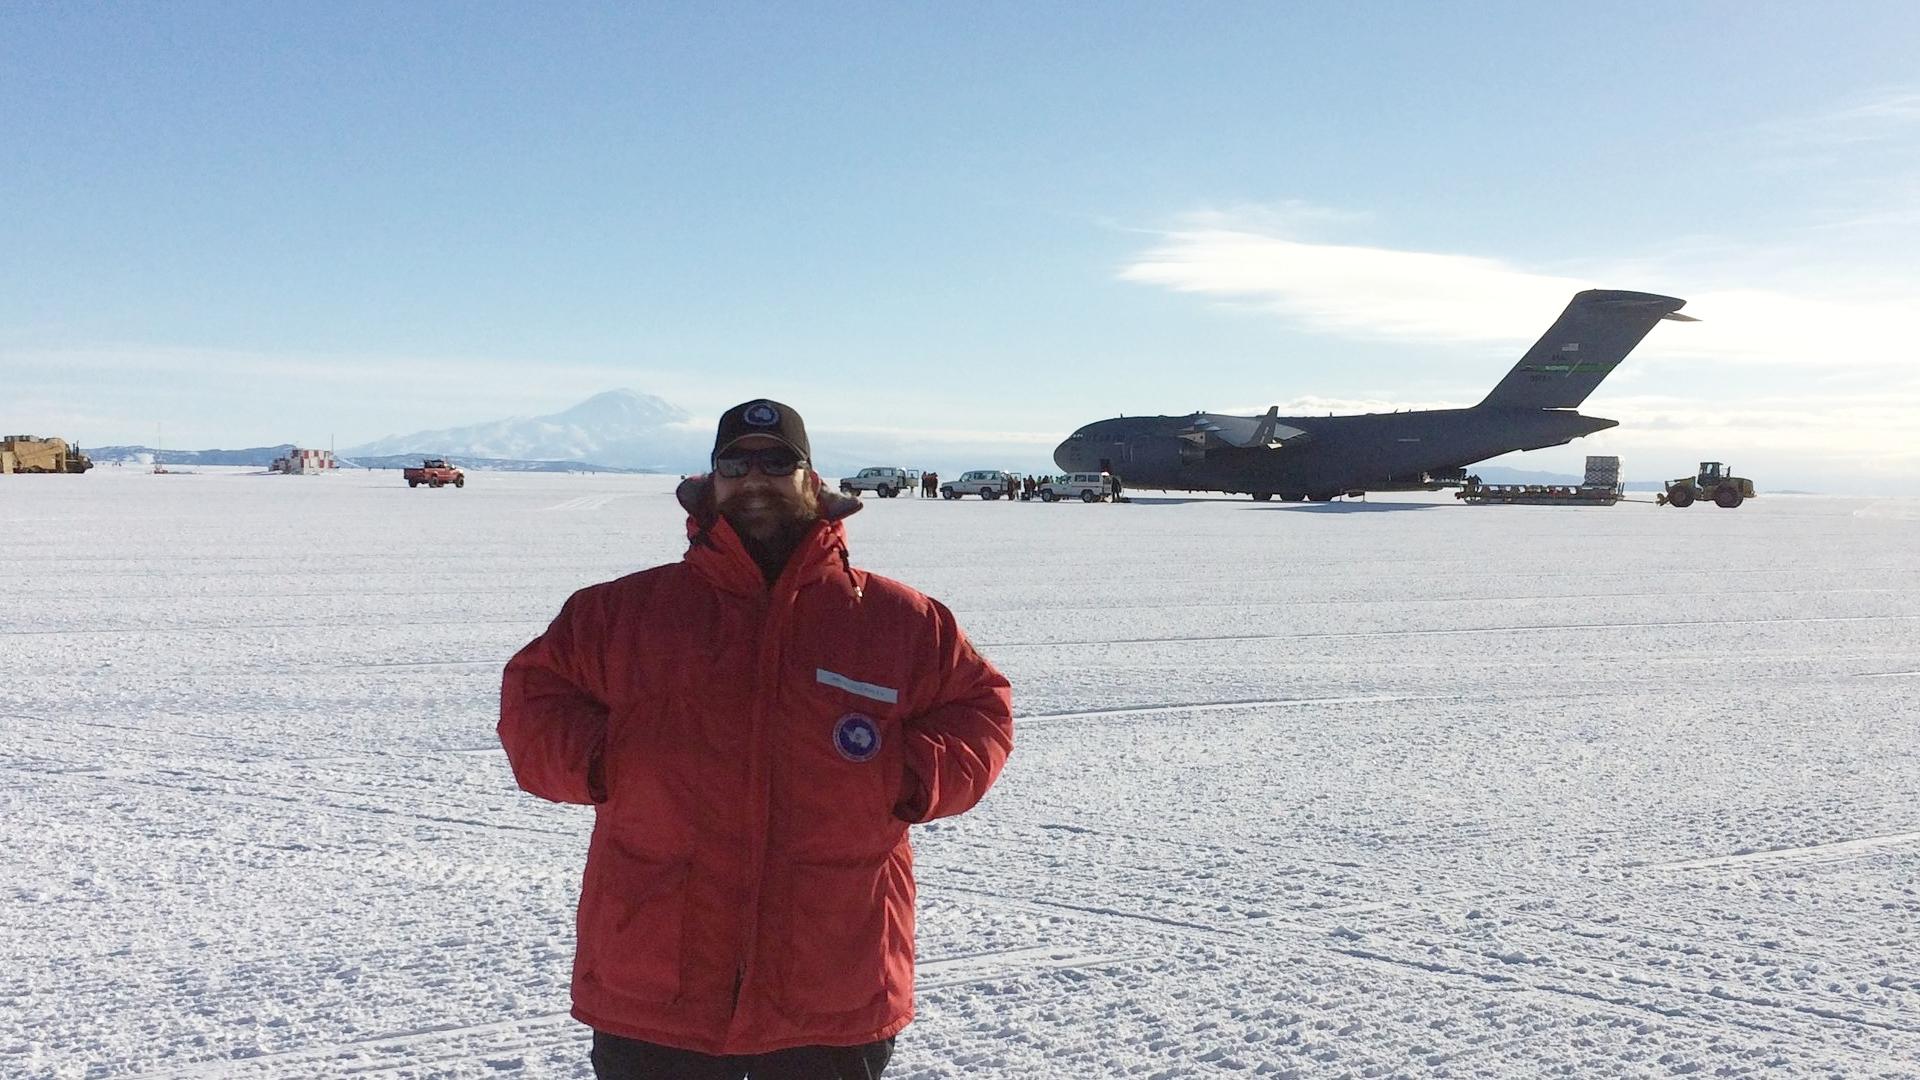 McMurdo Station, January 2017